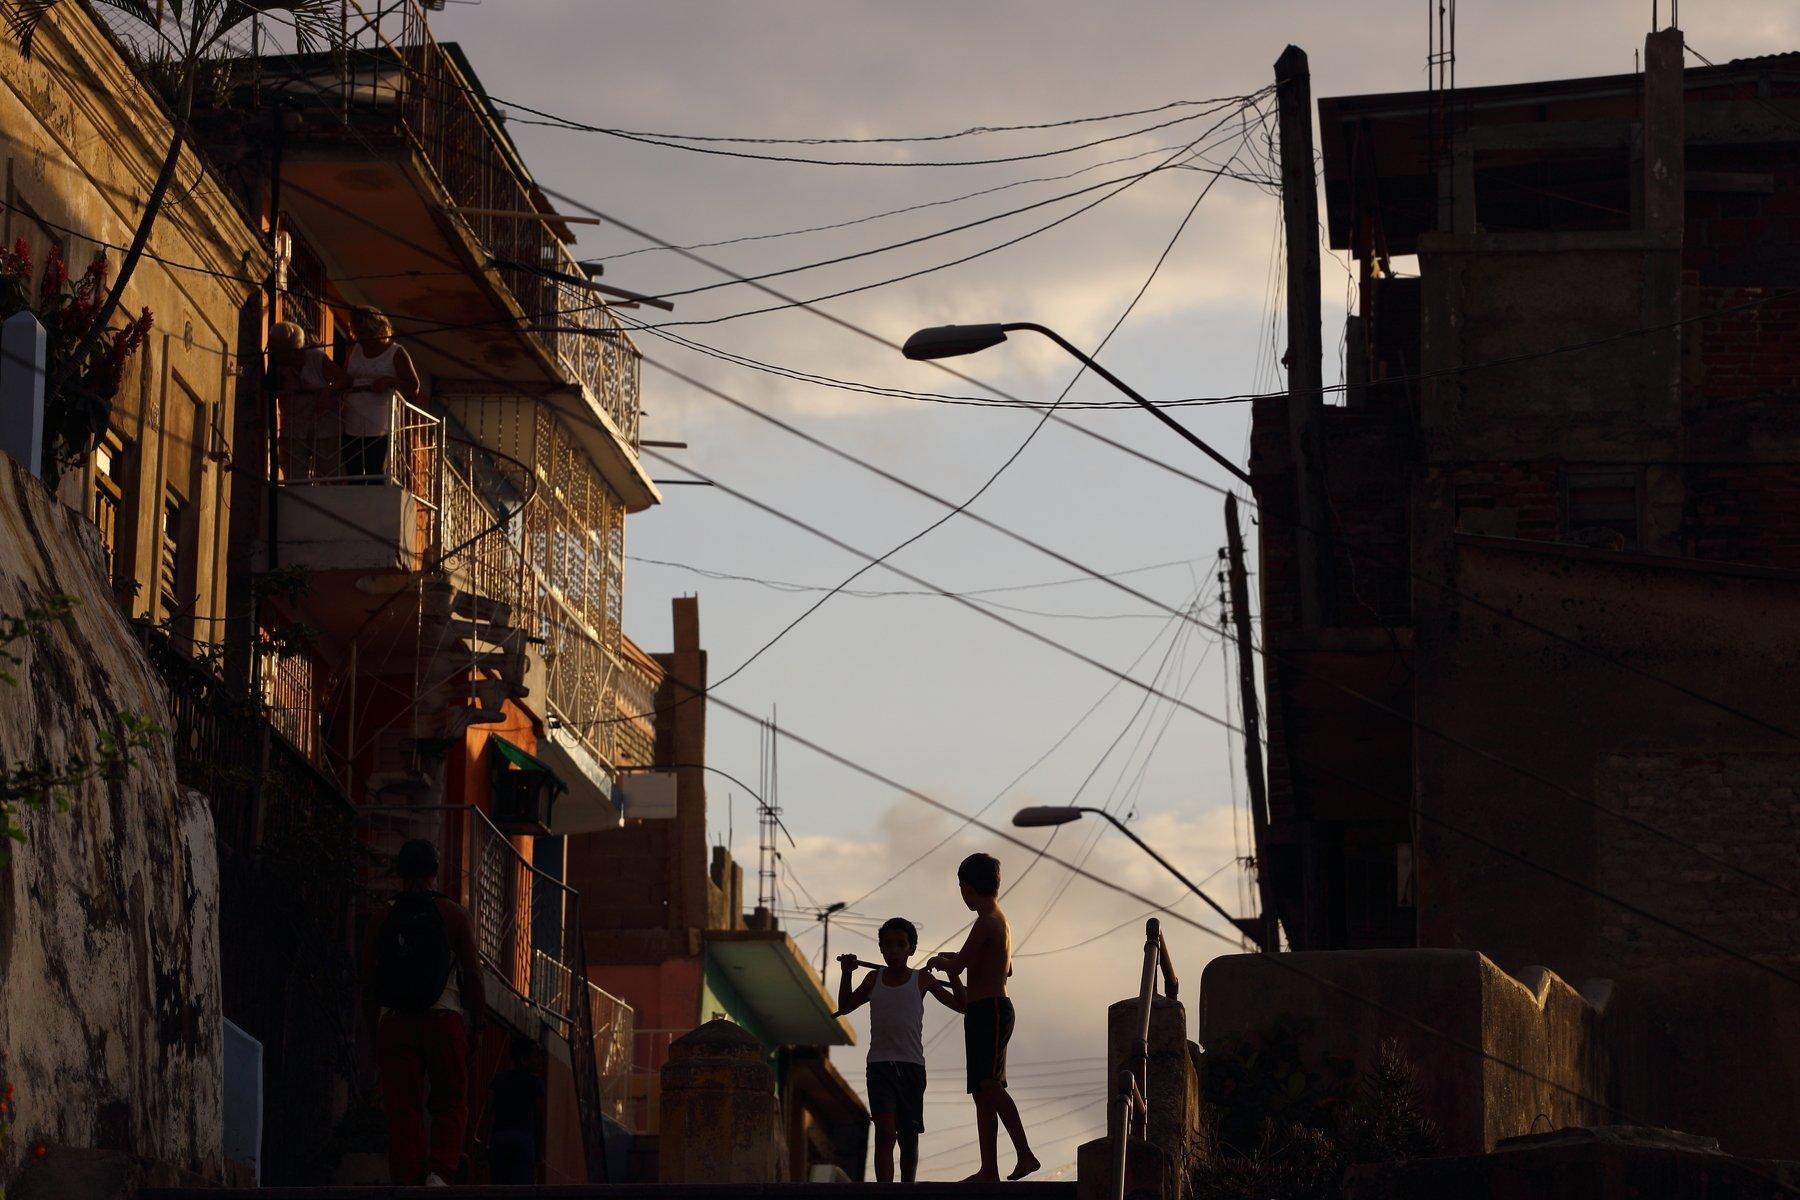 Гавана, Сантьяго, Сантьяго де Куба, силуэт, тень, Куба, улица, Usoltceva Anastasiia